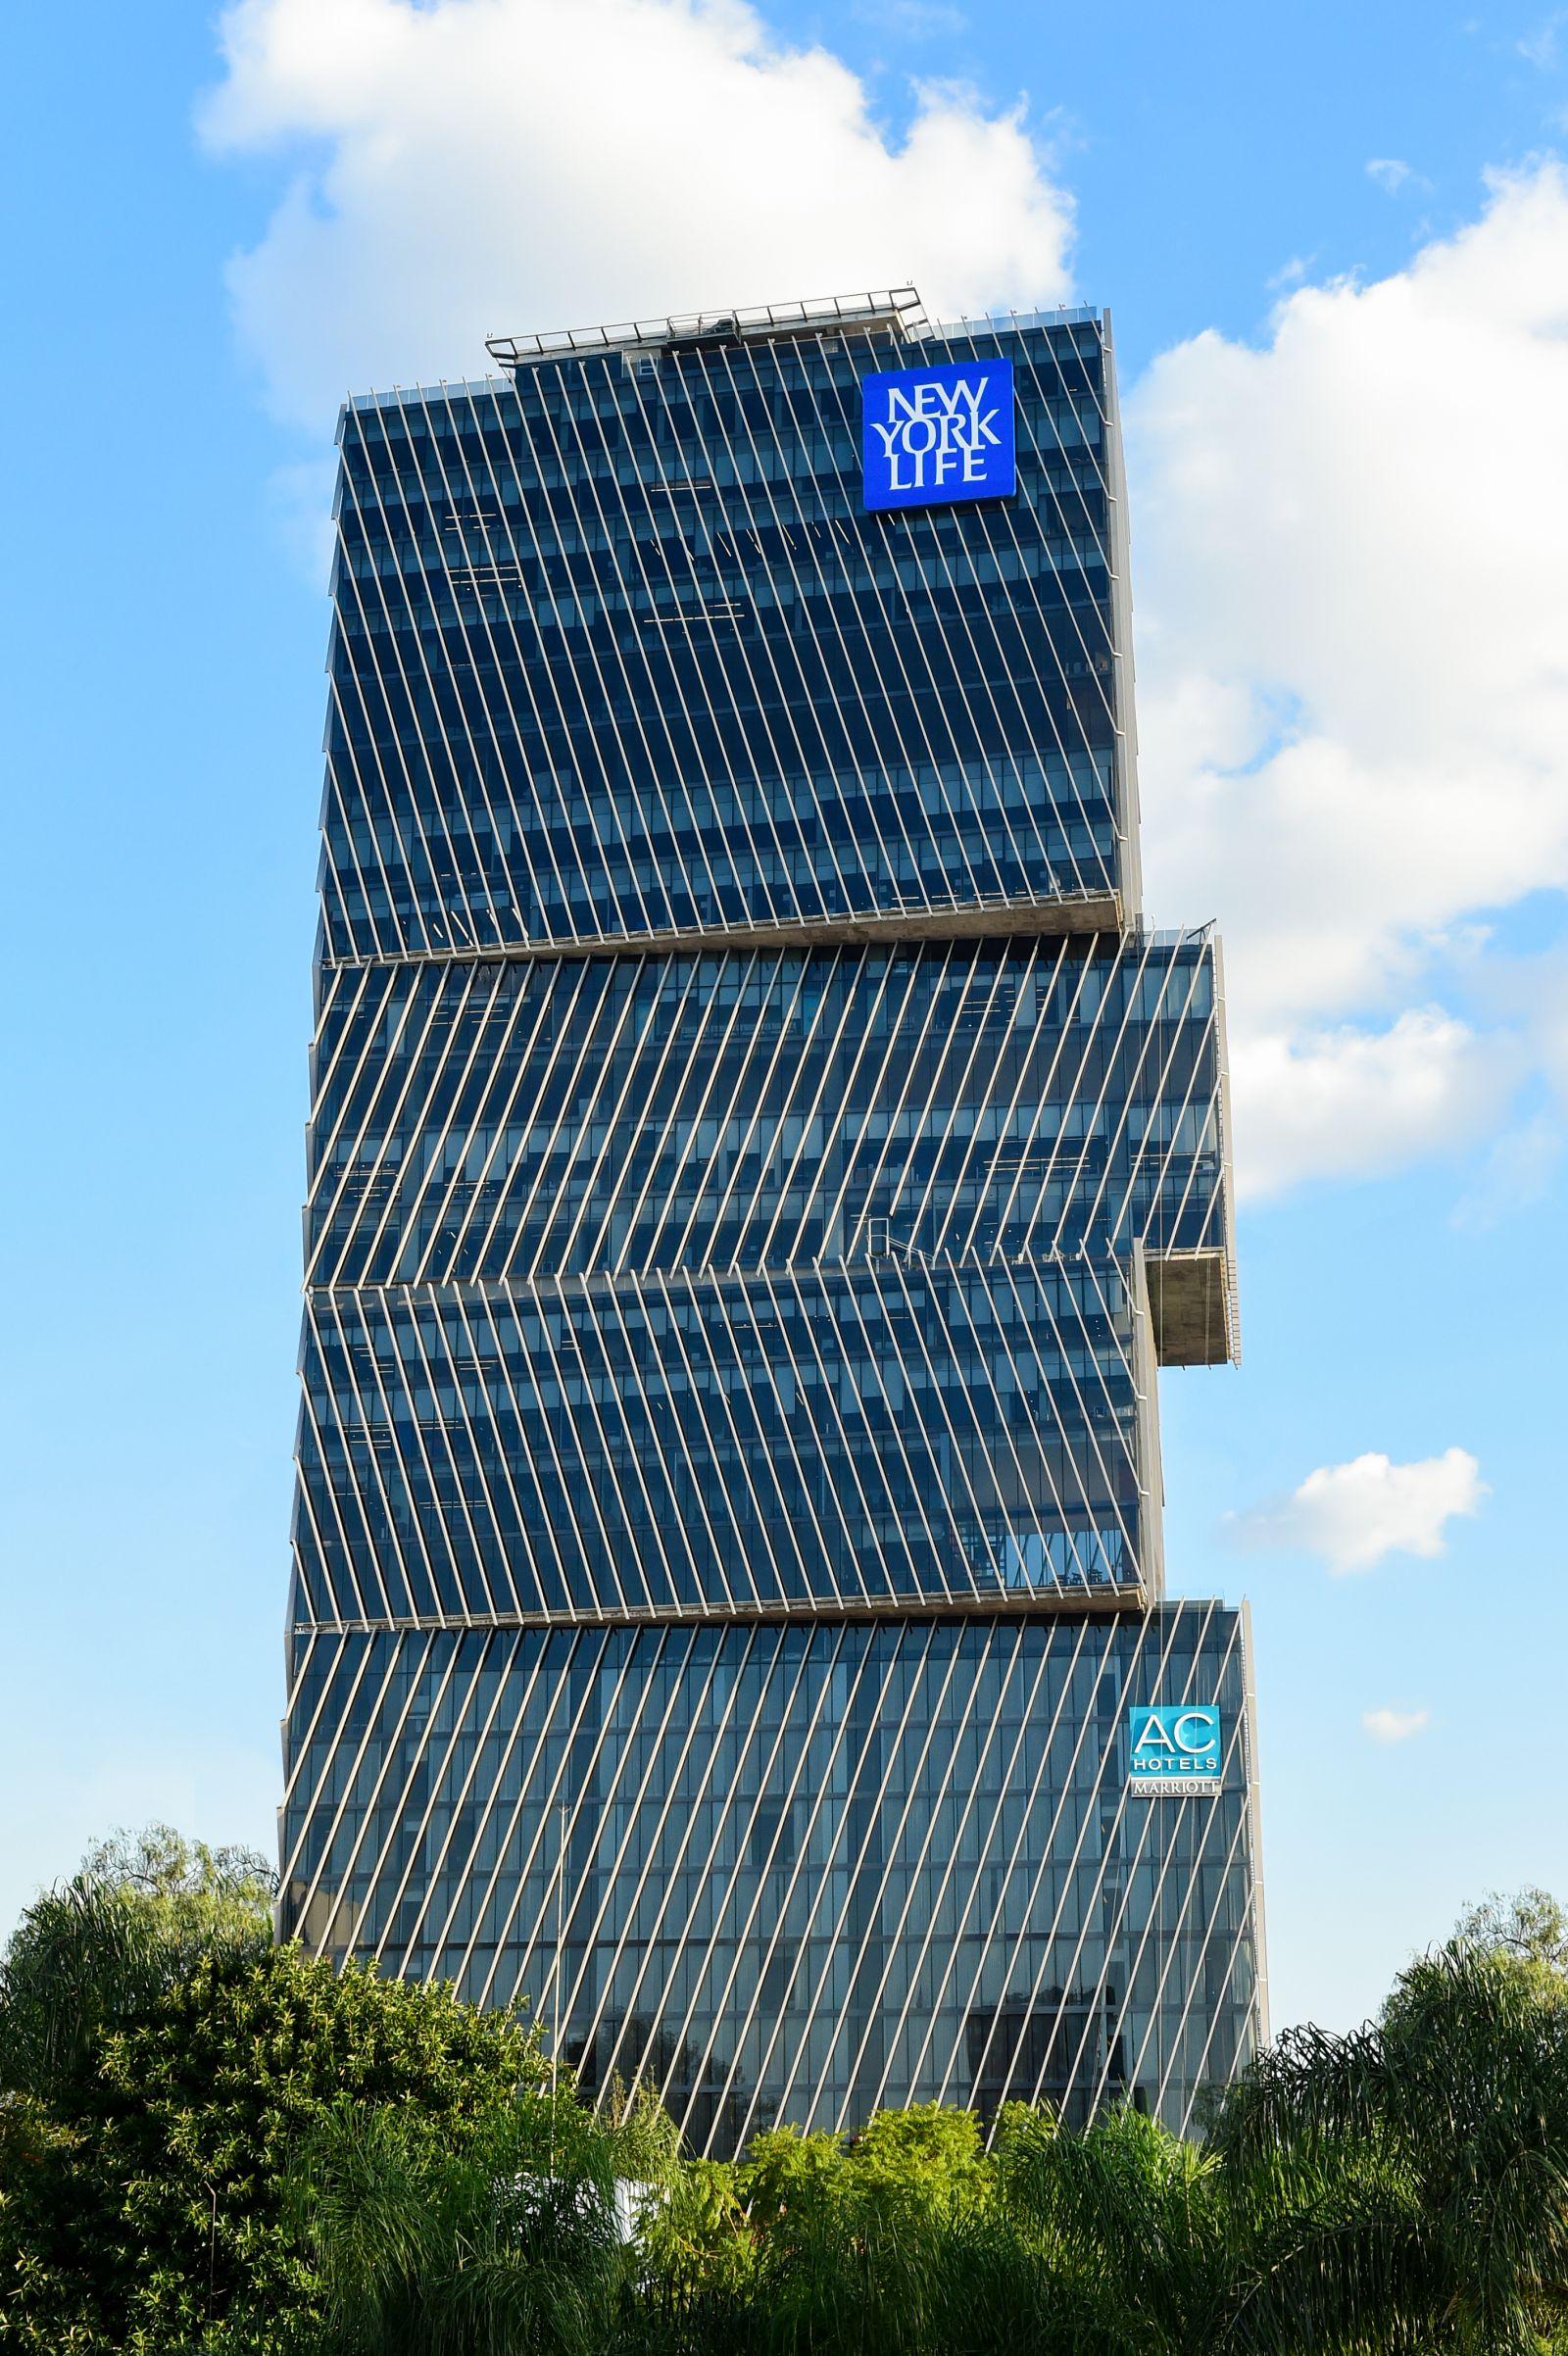 IOS OFFICES, AMERICAS 1500, Guadalajara